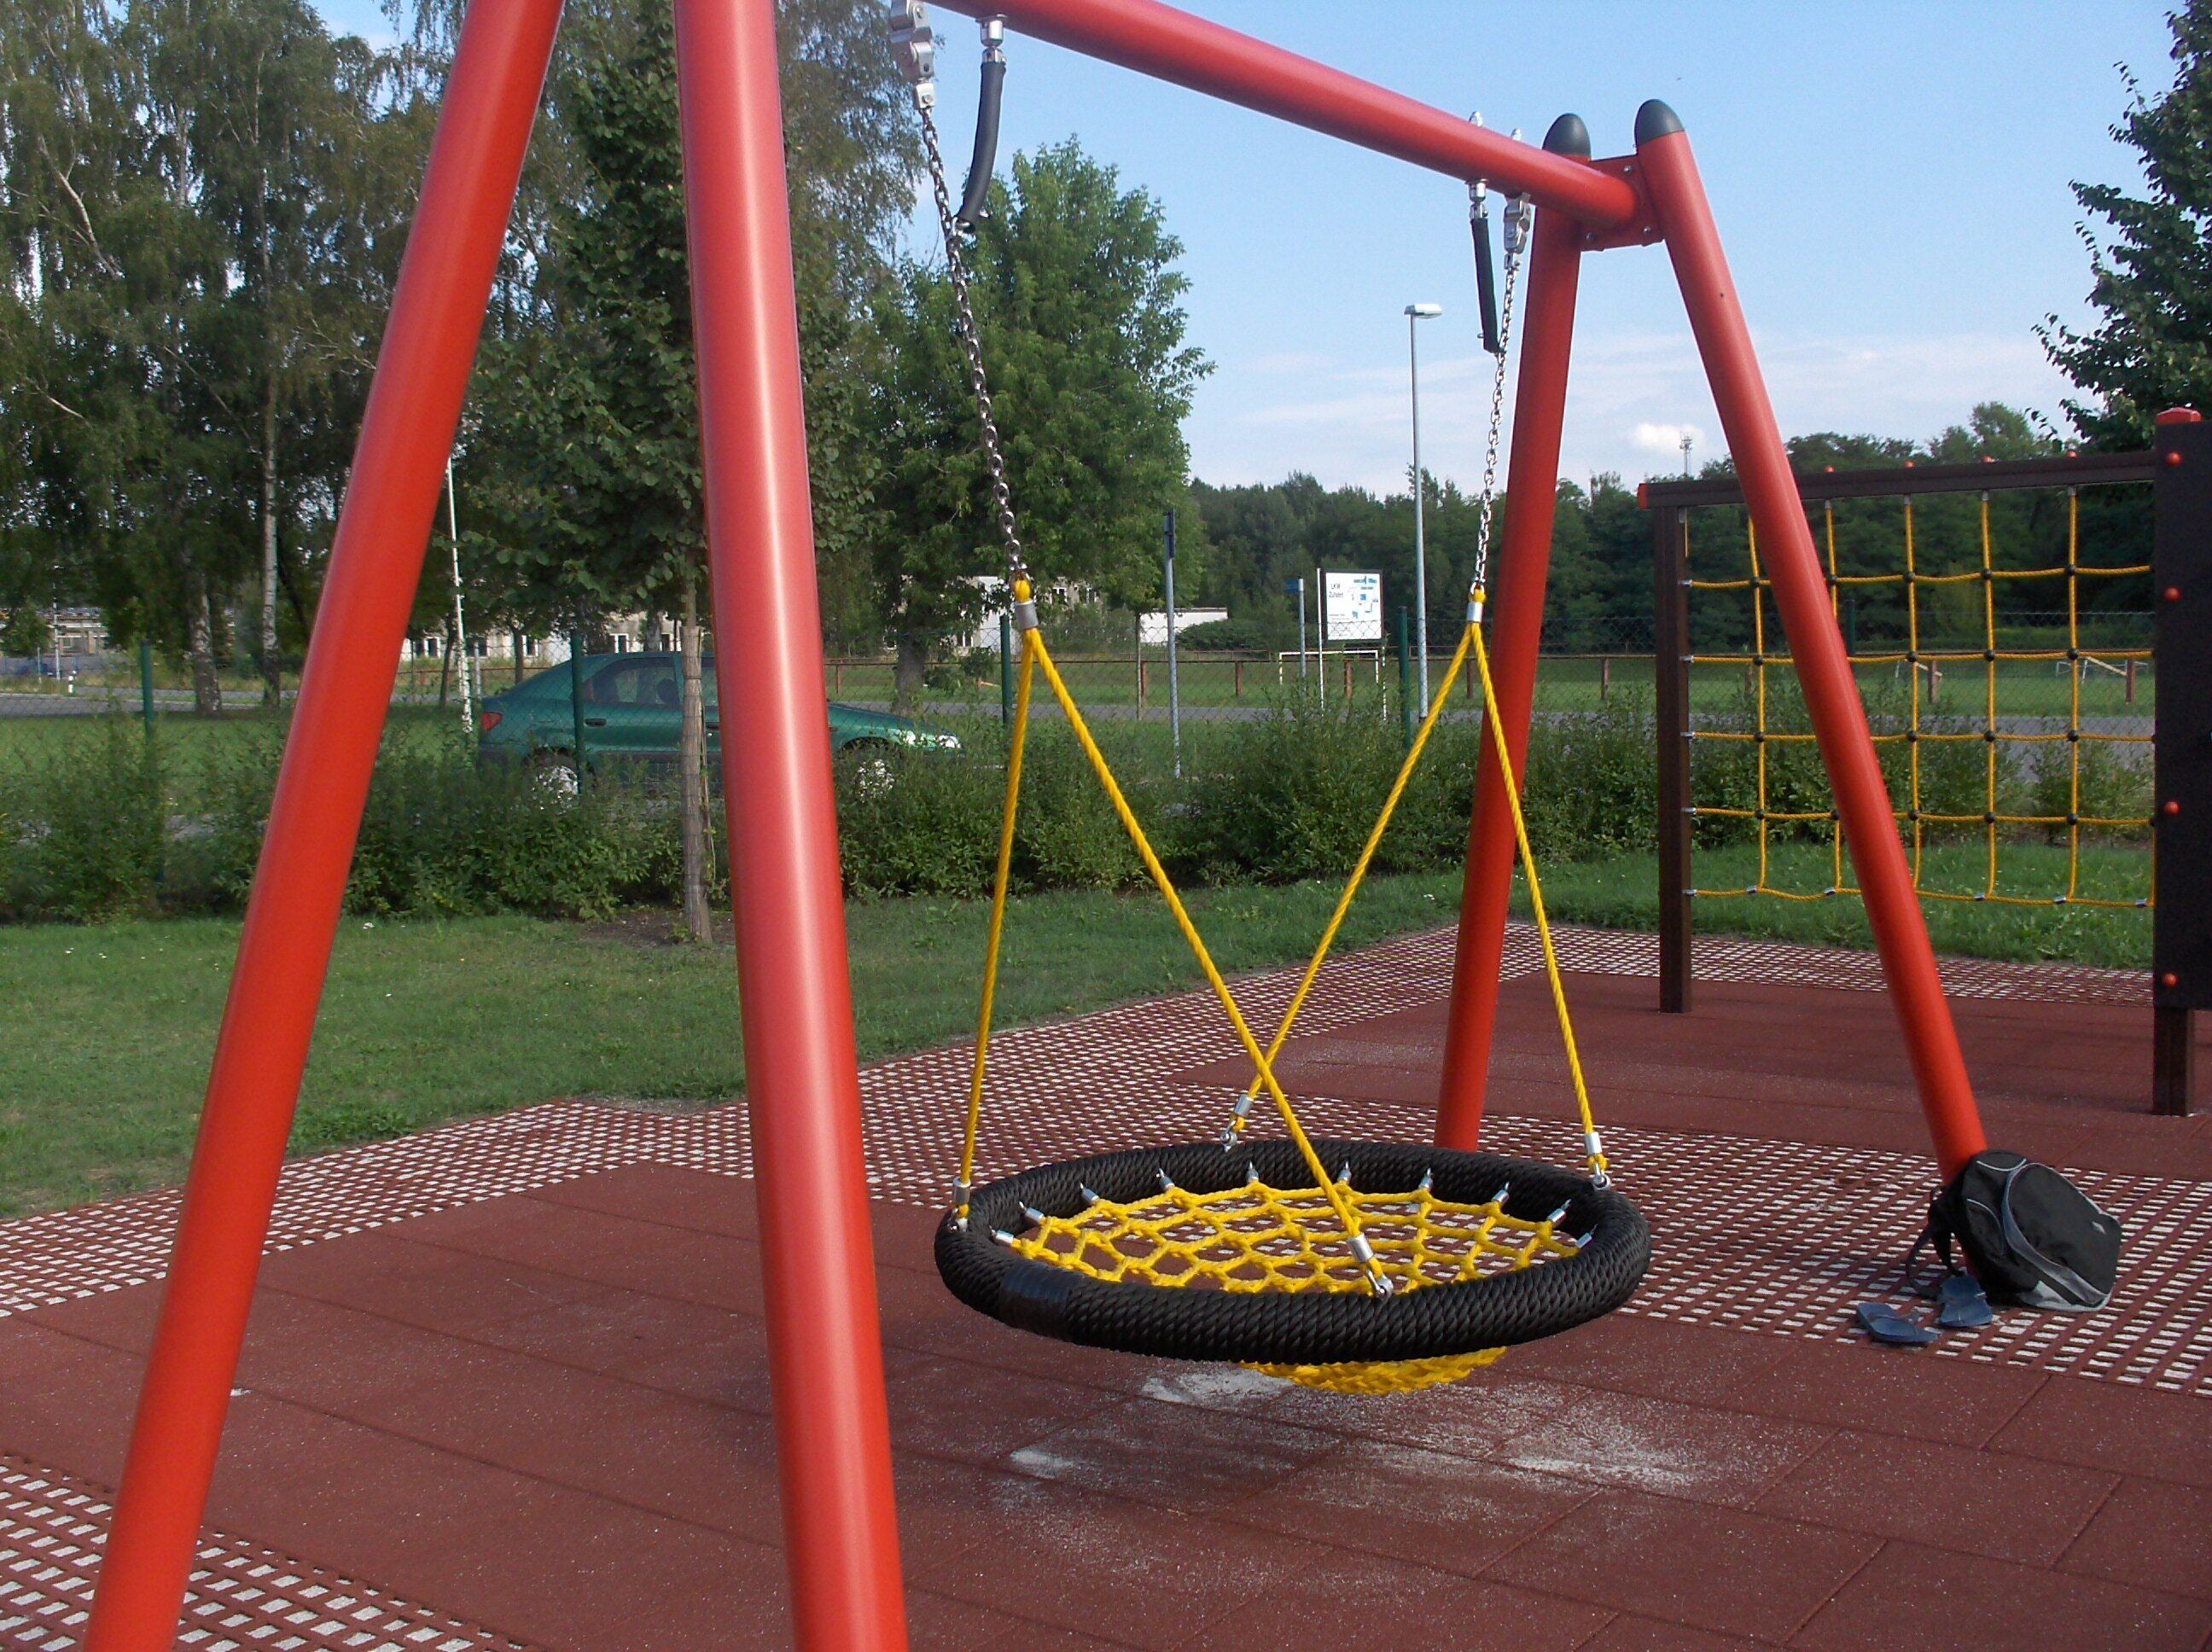 Spielplatz Tröbitz Nesetschaukel